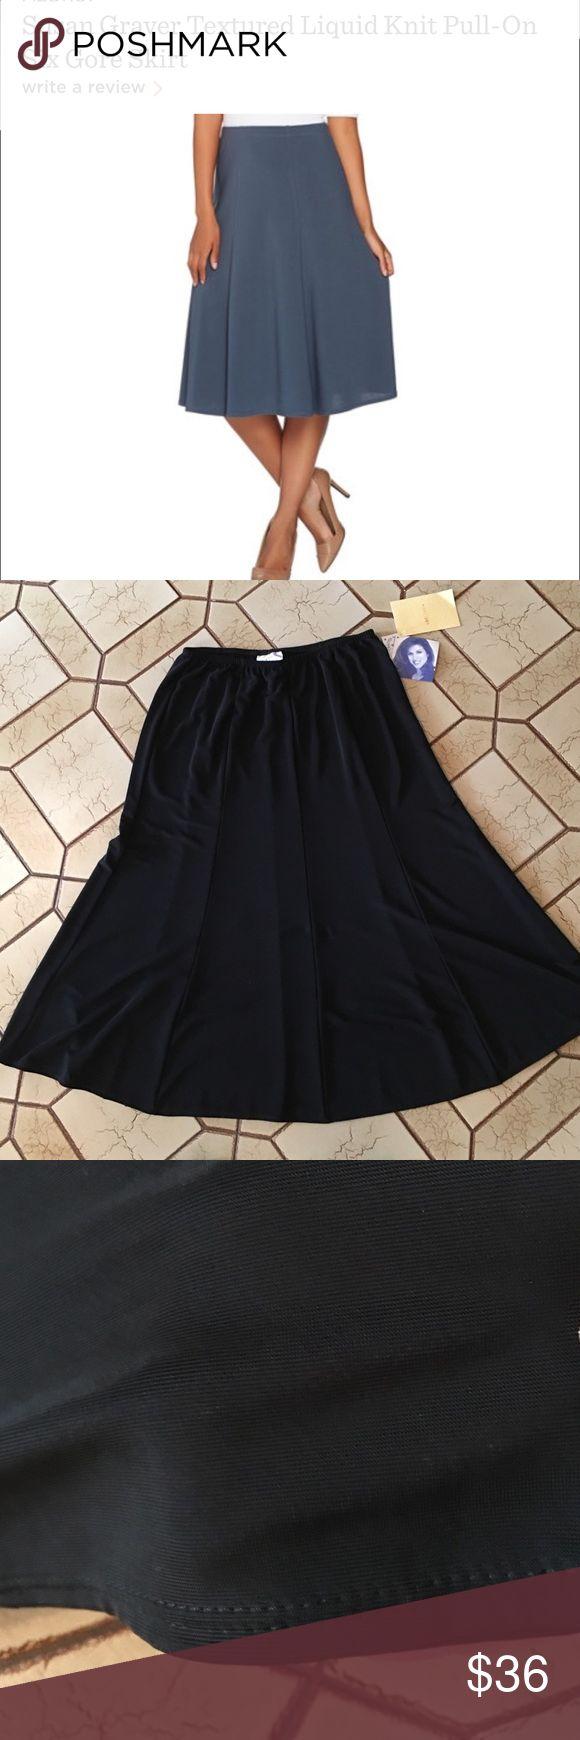 Susan Graver 6 panel gored knit skirt NWT Susan Graver slinky net six panel Gord skirt. Gorgeous soft slinky material. Elastic pull on waist.  Skirt is brand-new with tags Susan Graver Skirts